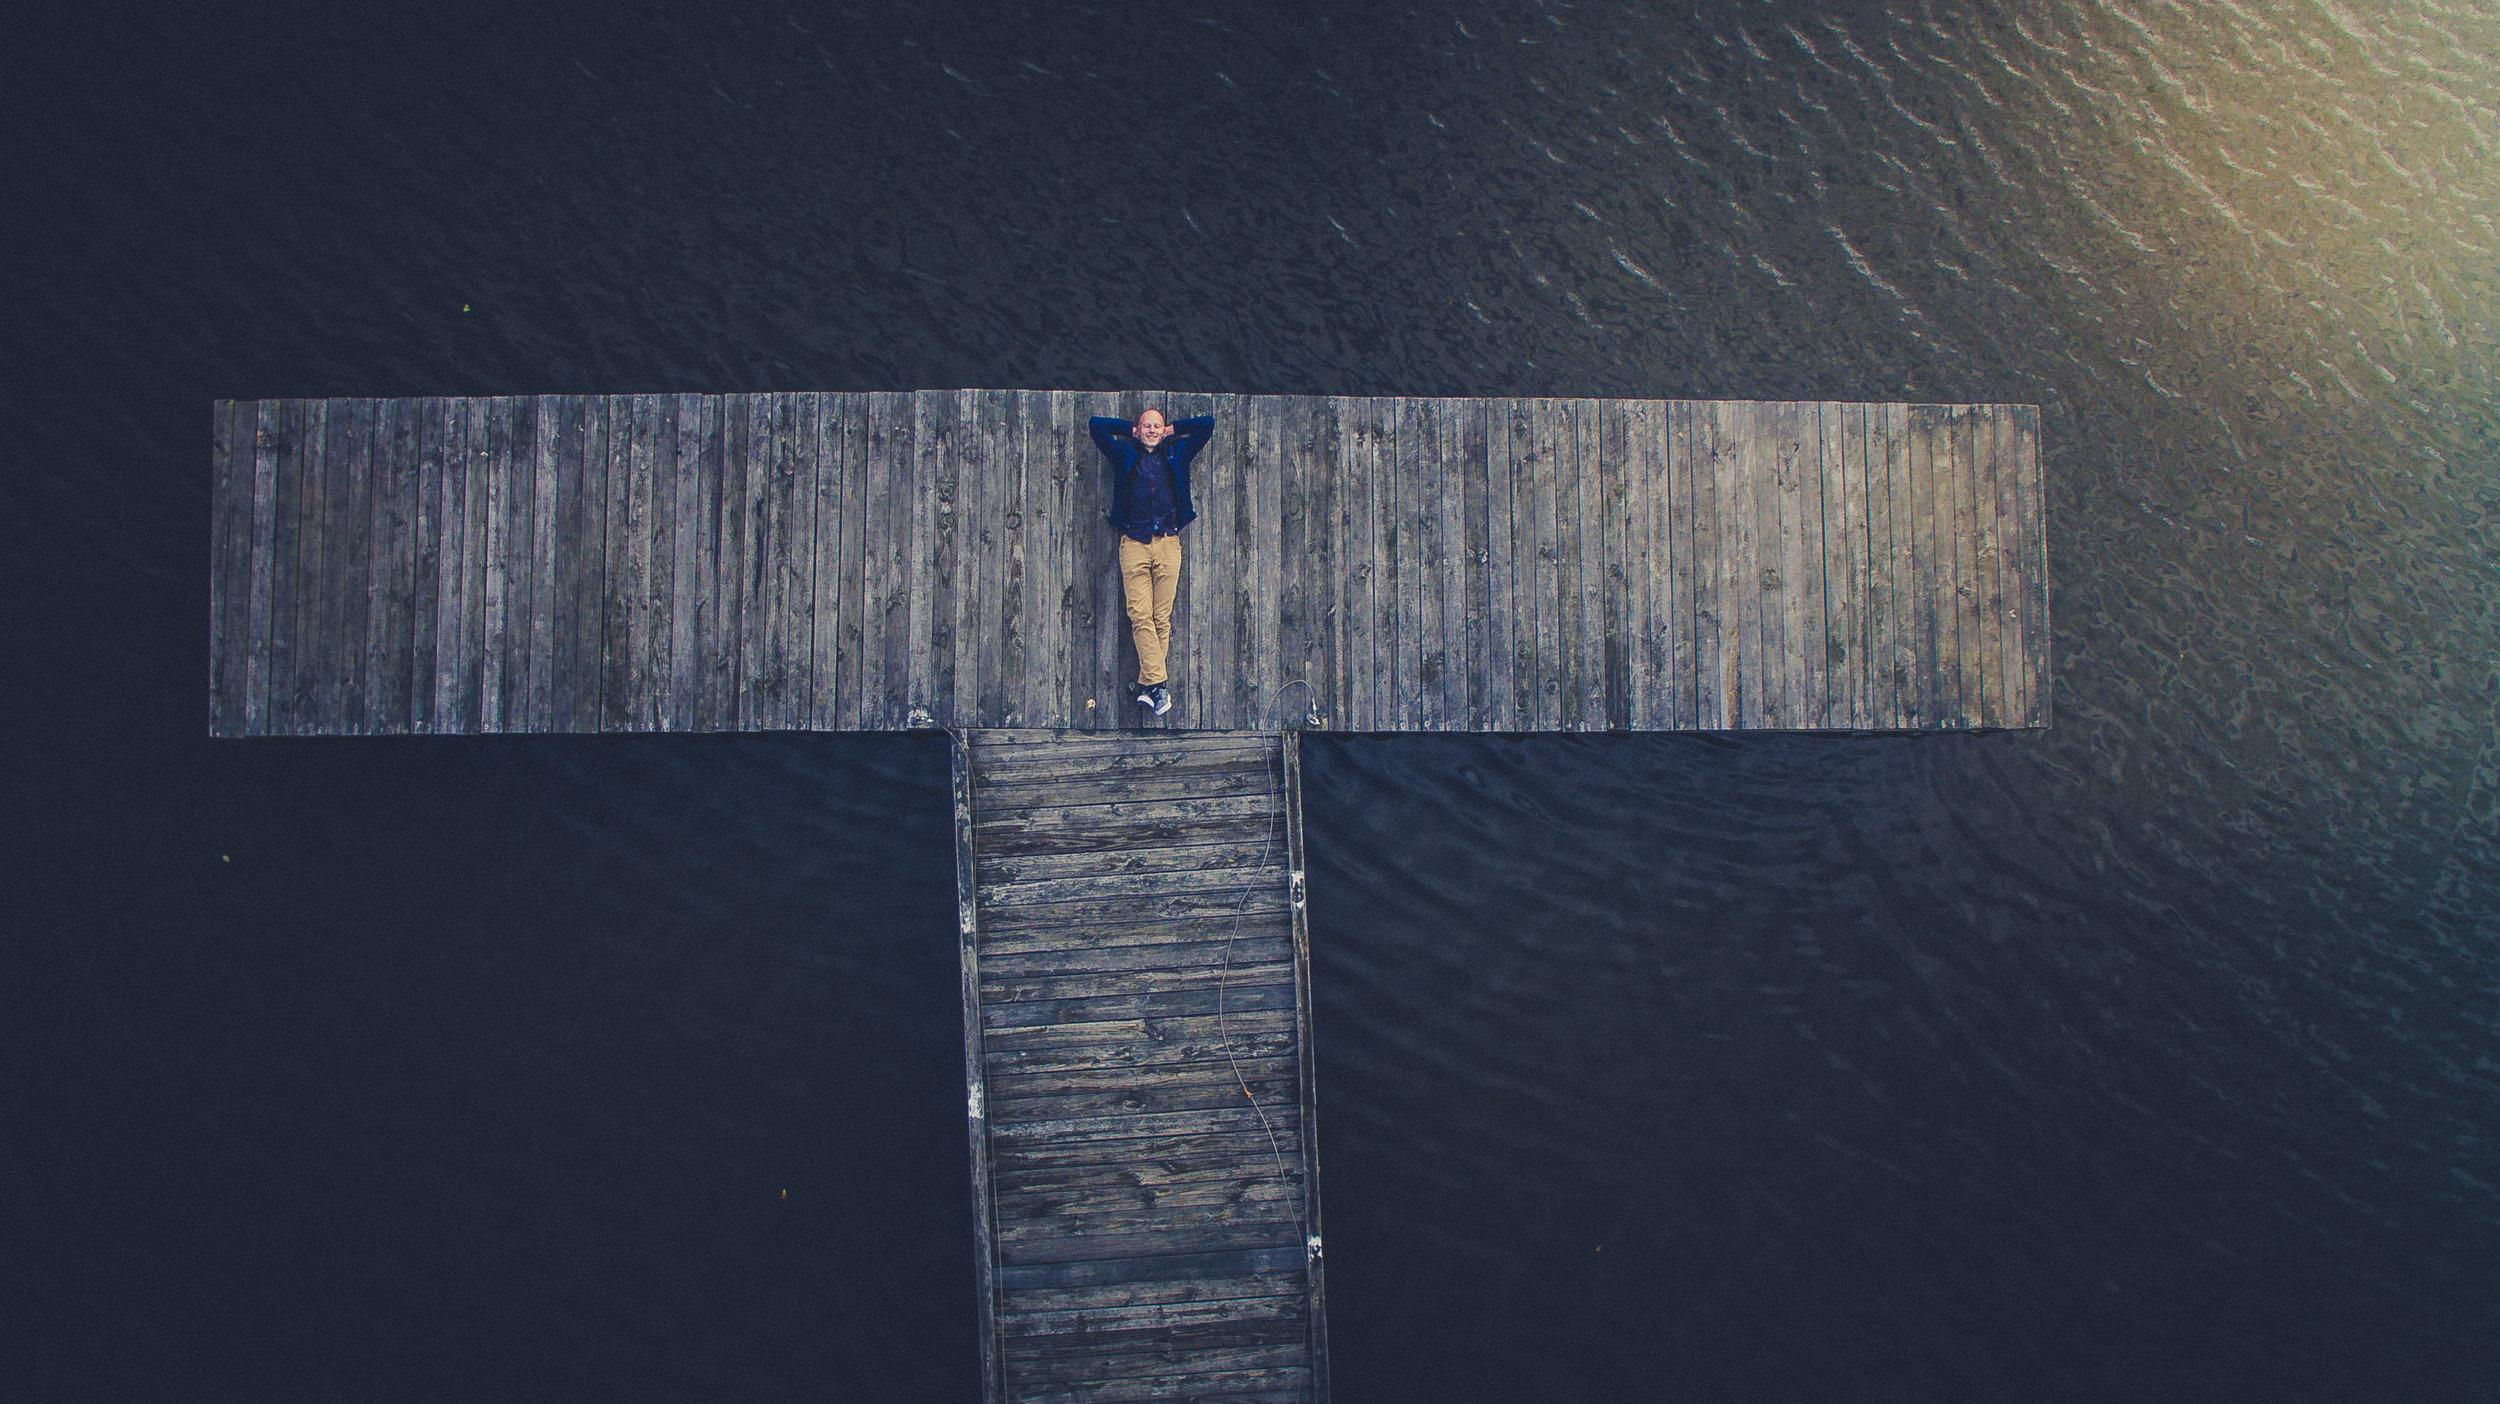 Dom Rock pier lums pond drone 5 (1 of 1).jpg